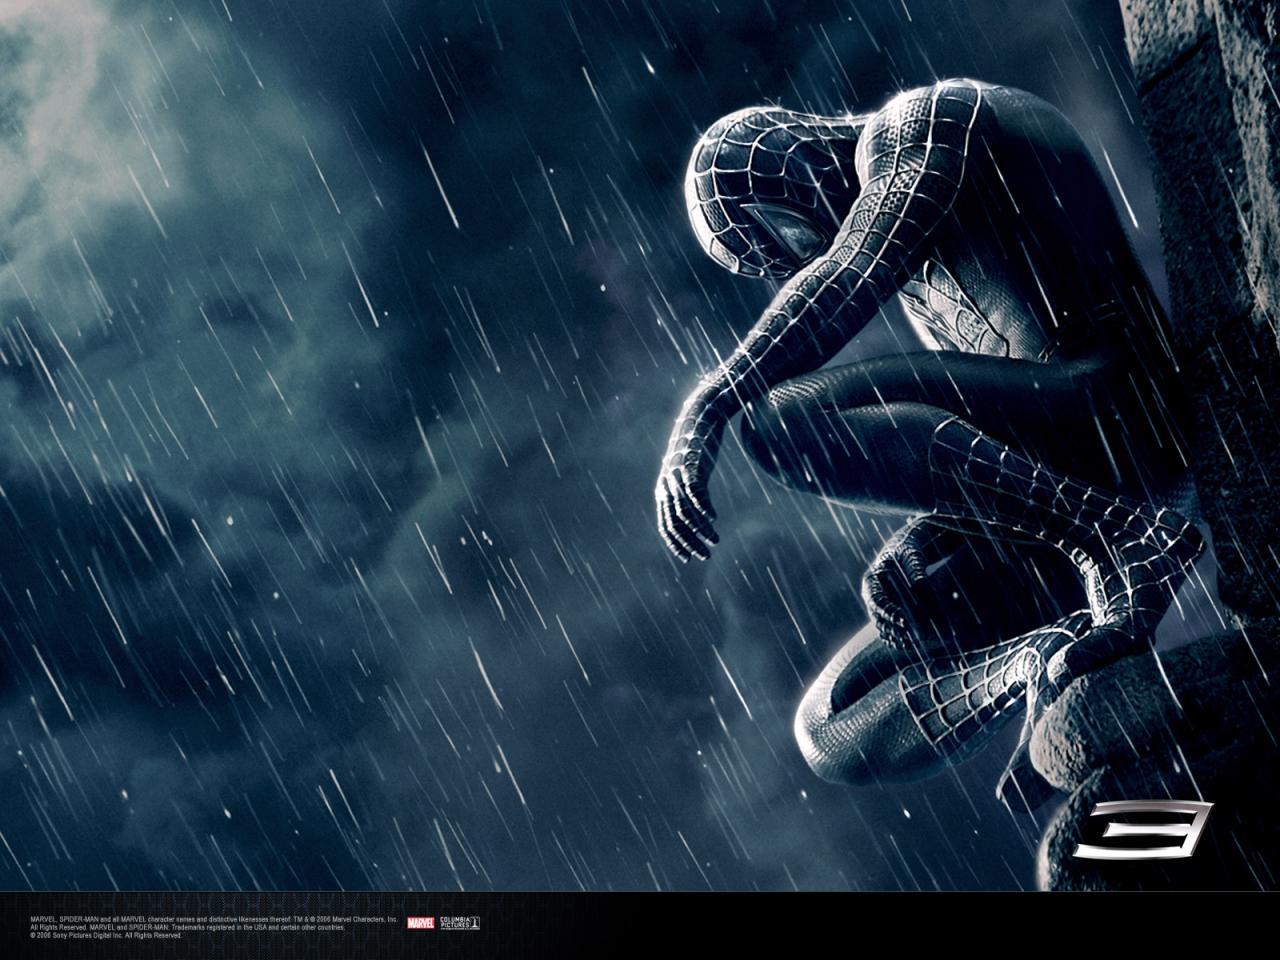 Wallpaper Spiderman gargouille costume noir